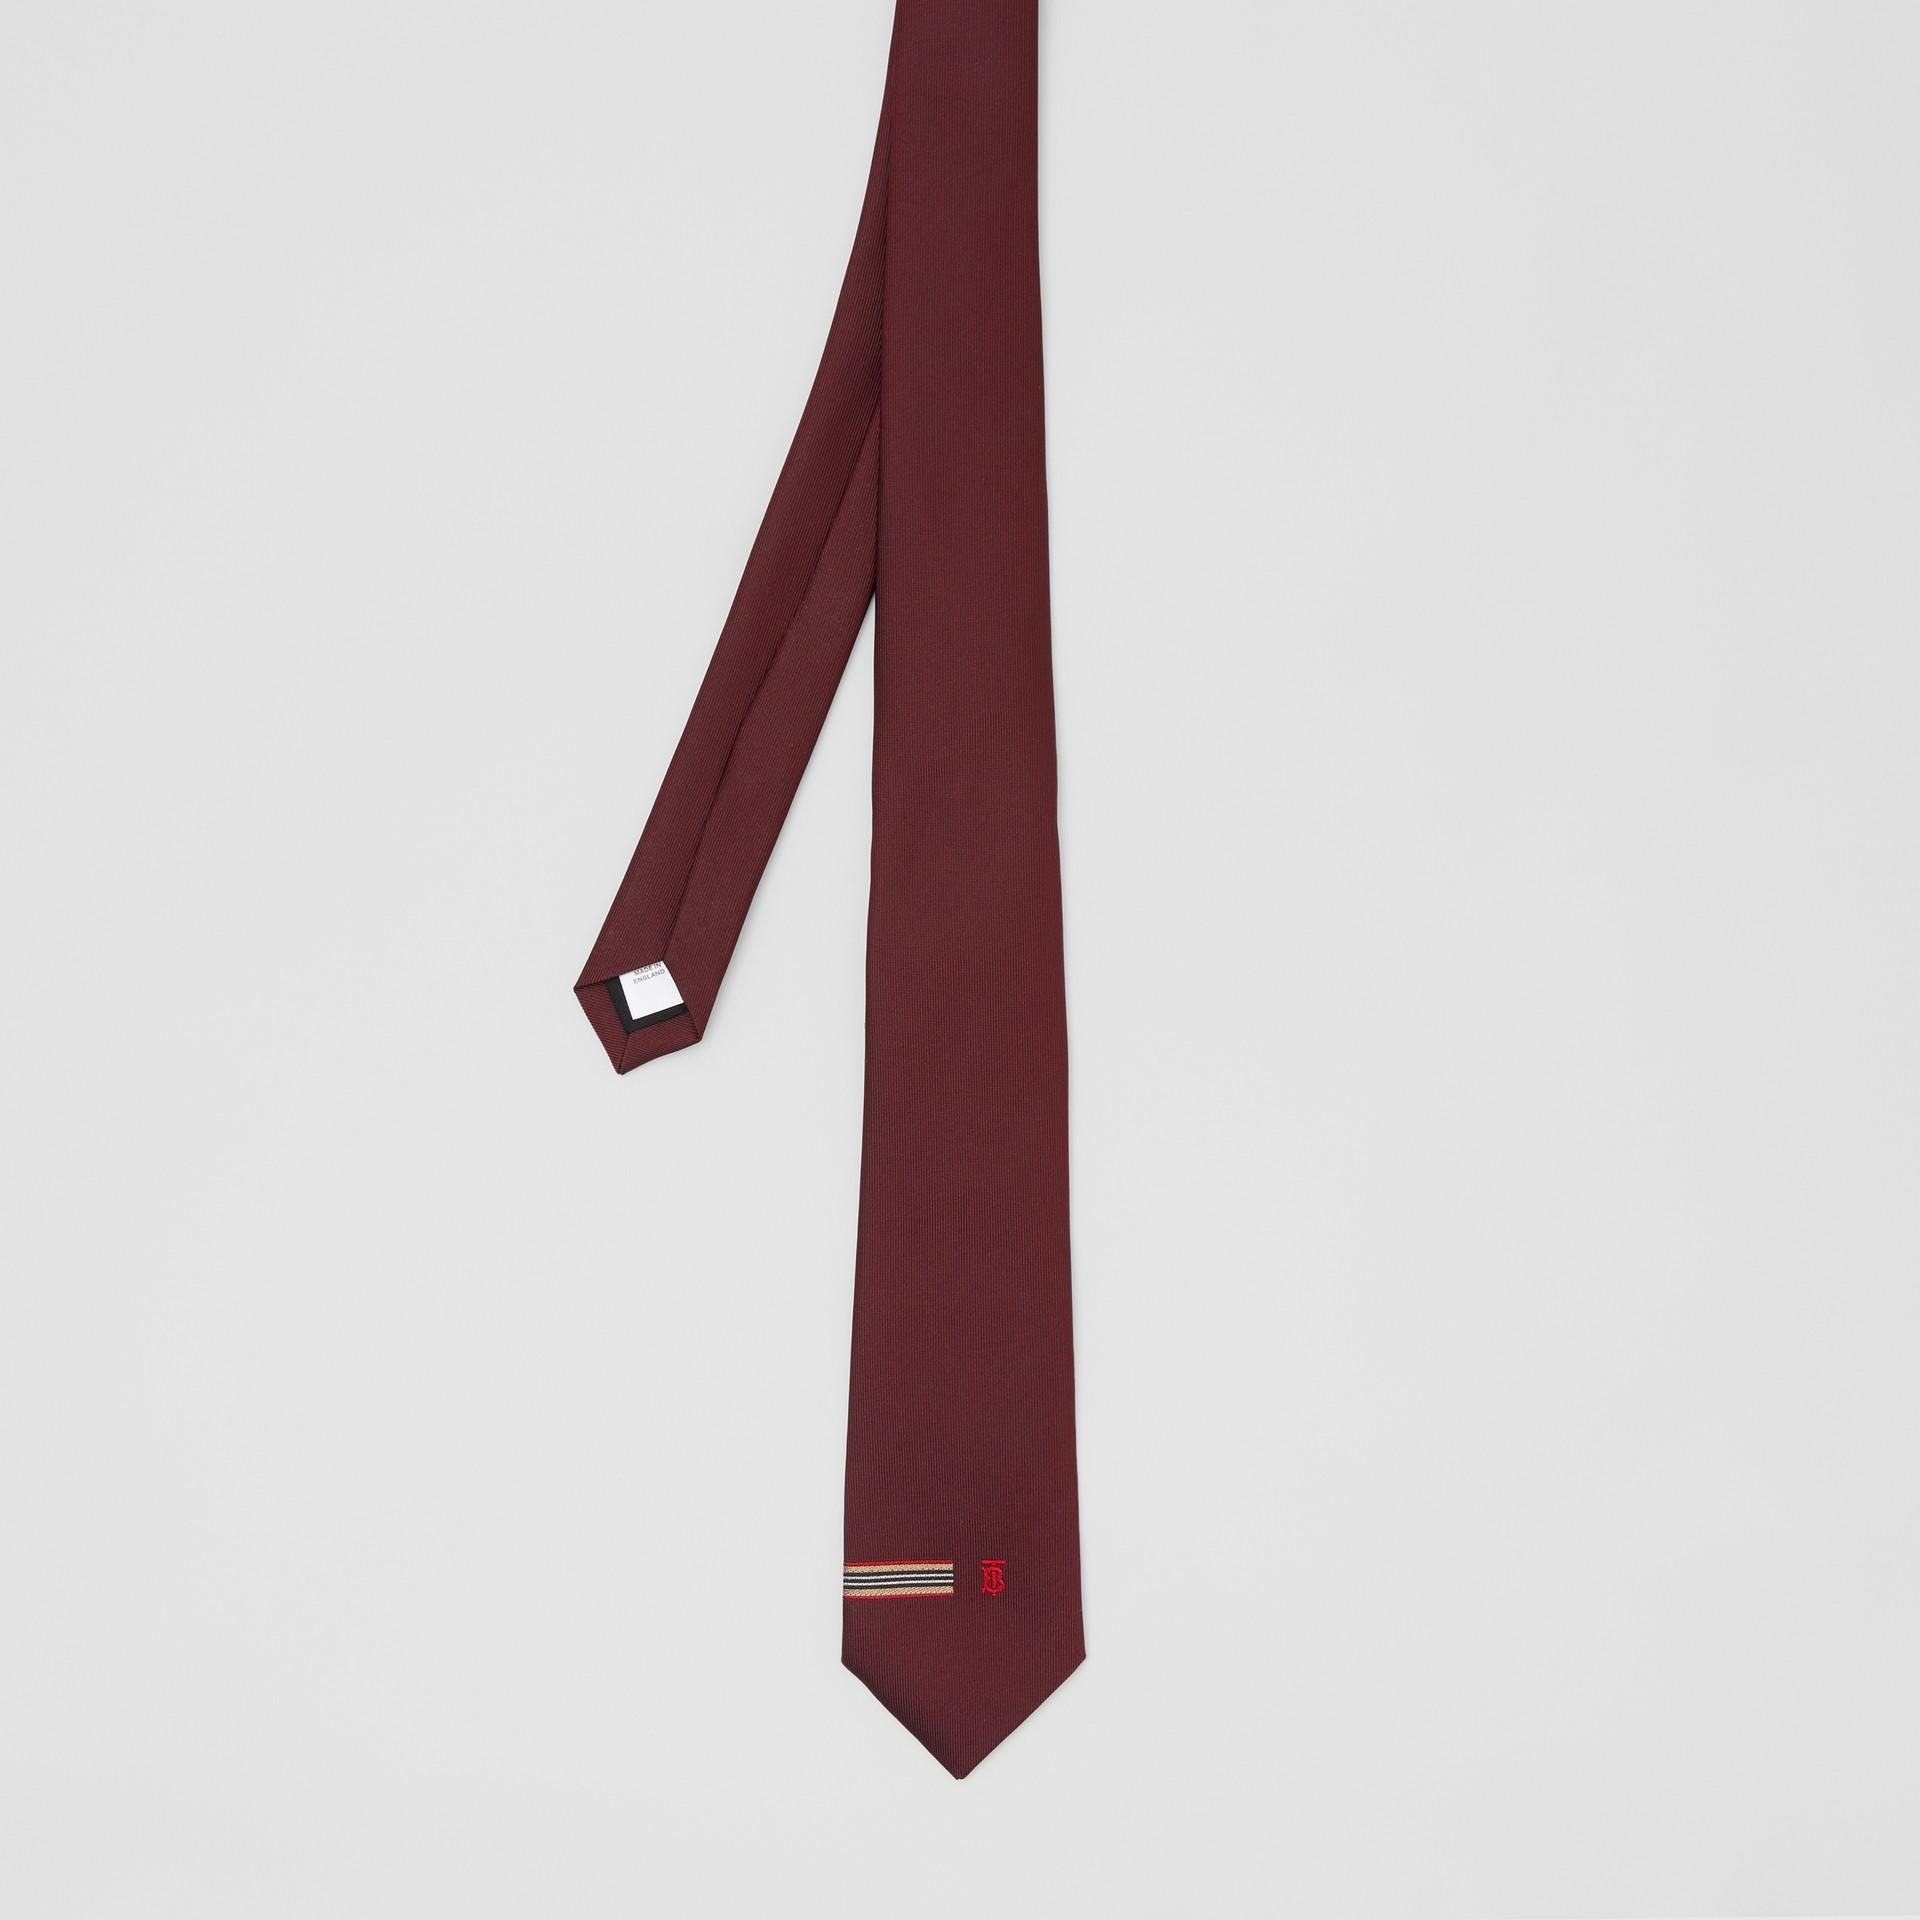 Classic Cut Icon Stripe and Monogram Motif Silk Tie in Claret - Men | Burberry - gallery image 3